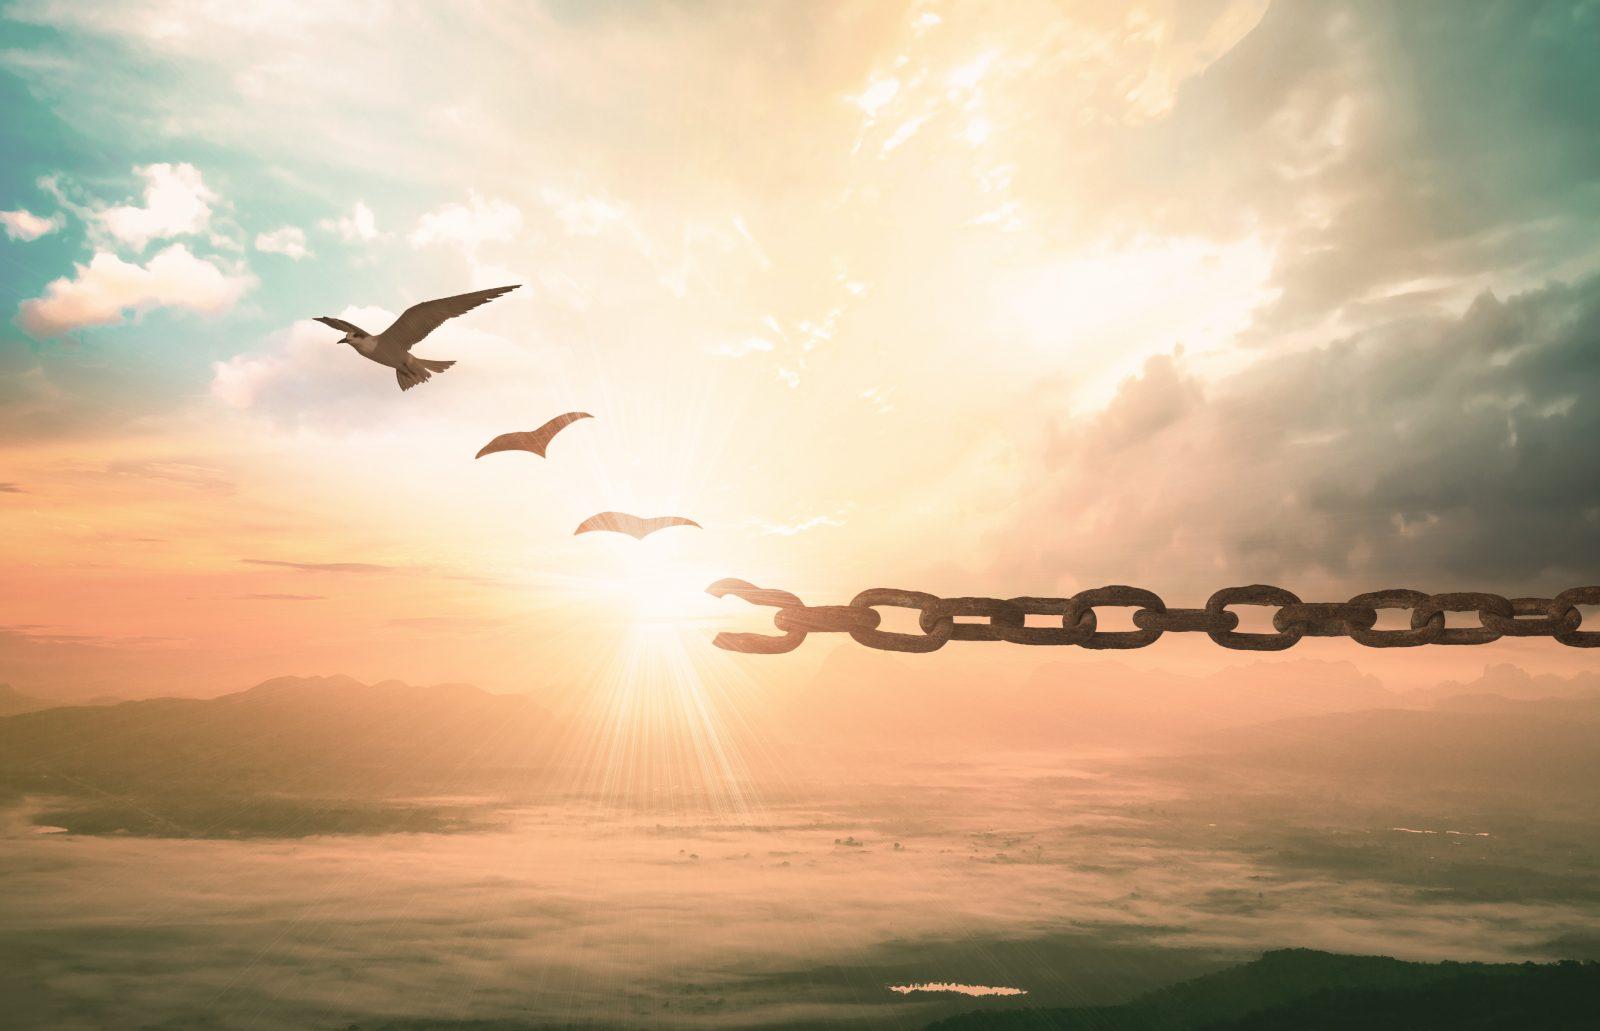 birds flying break free chains